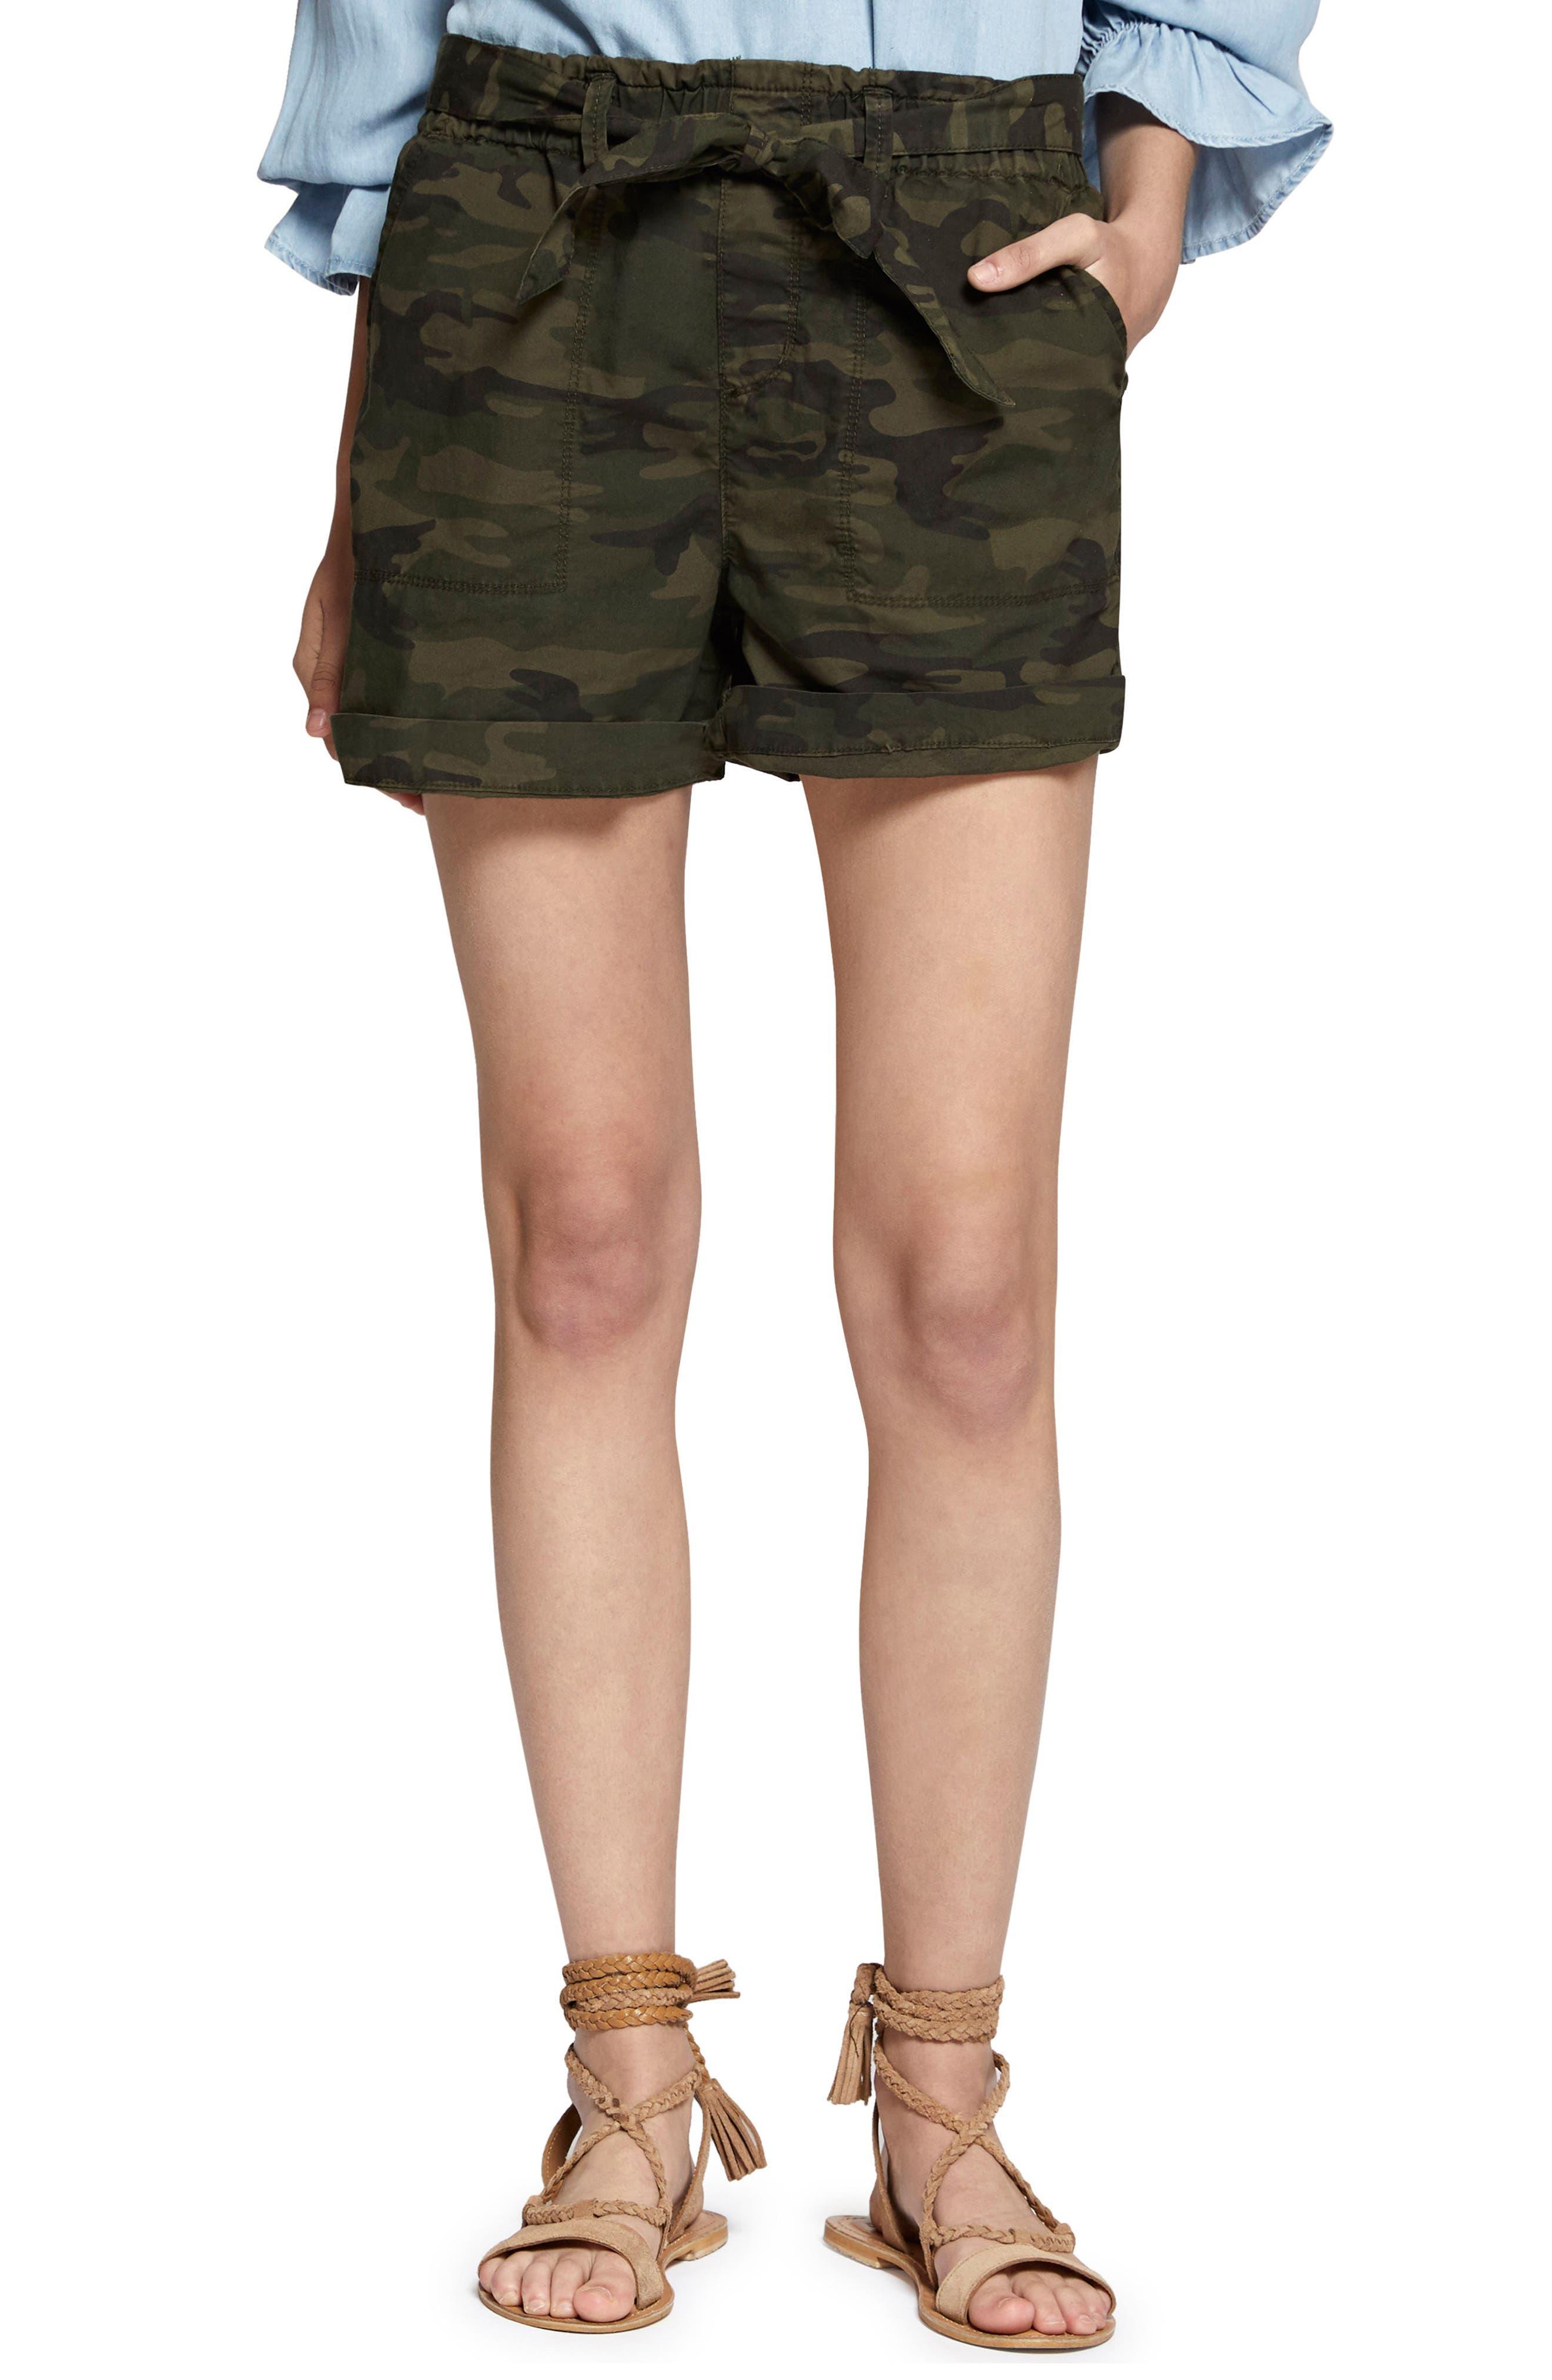 Daydreamer Stretch Cotton Camo Shorts,                             Main thumbnail 1, color,                             Mother Nature Camo